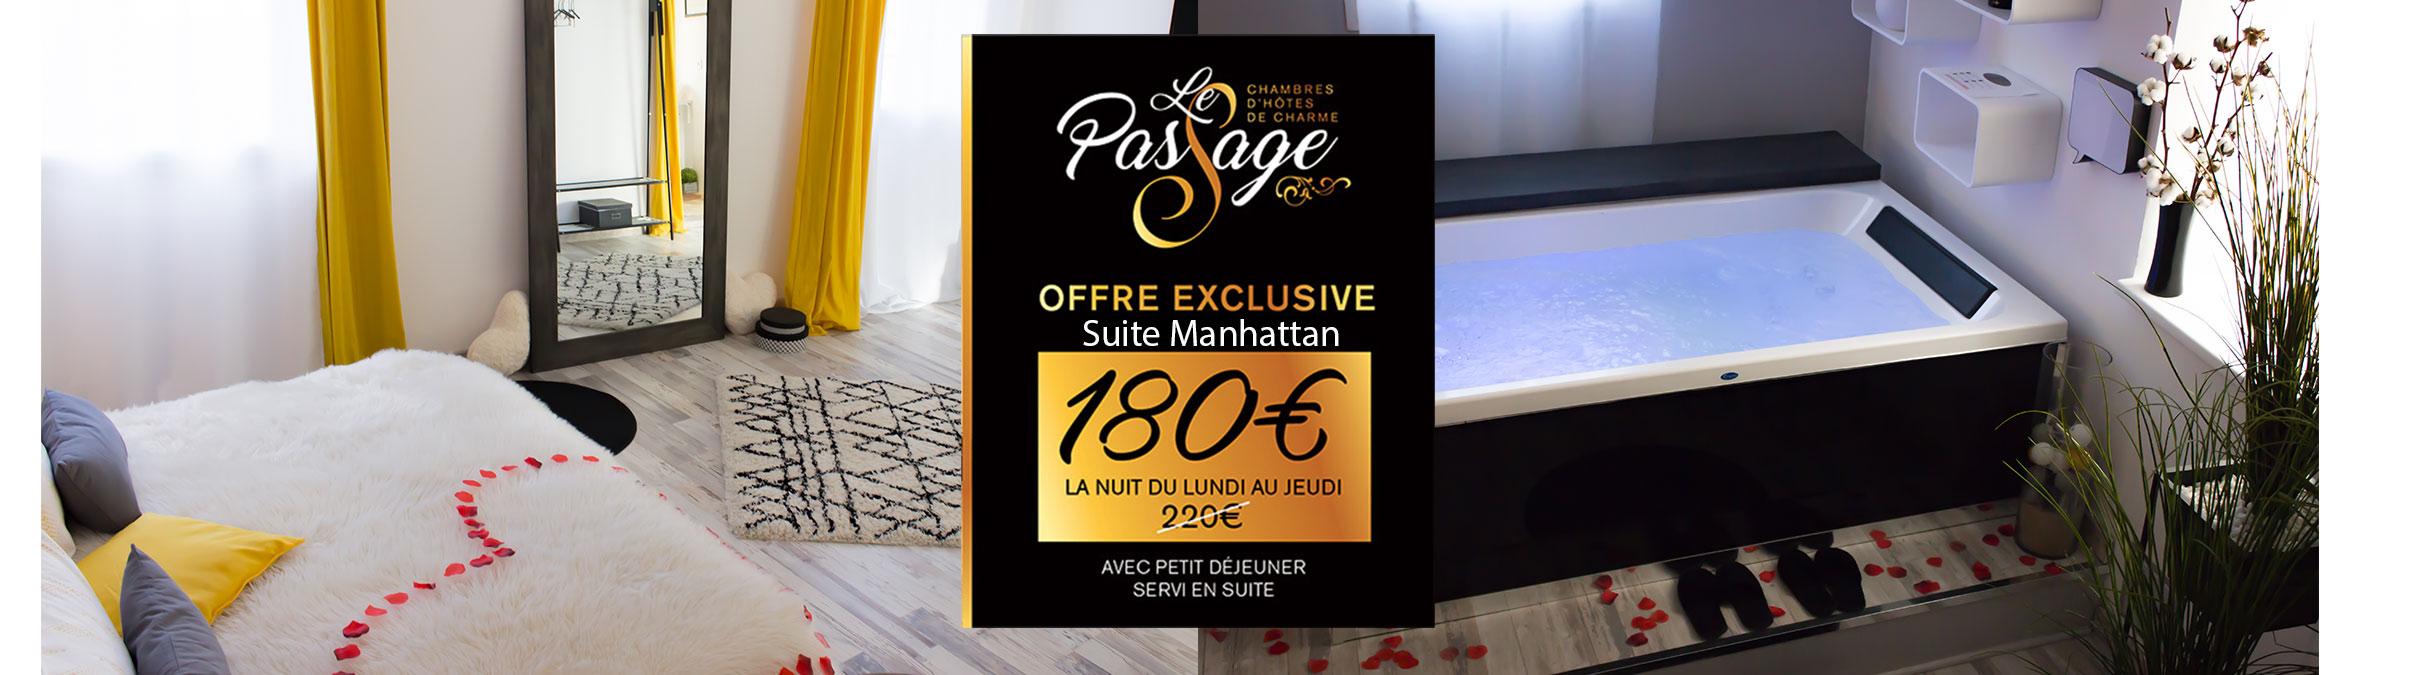 Tarif spécial suite Manhattan